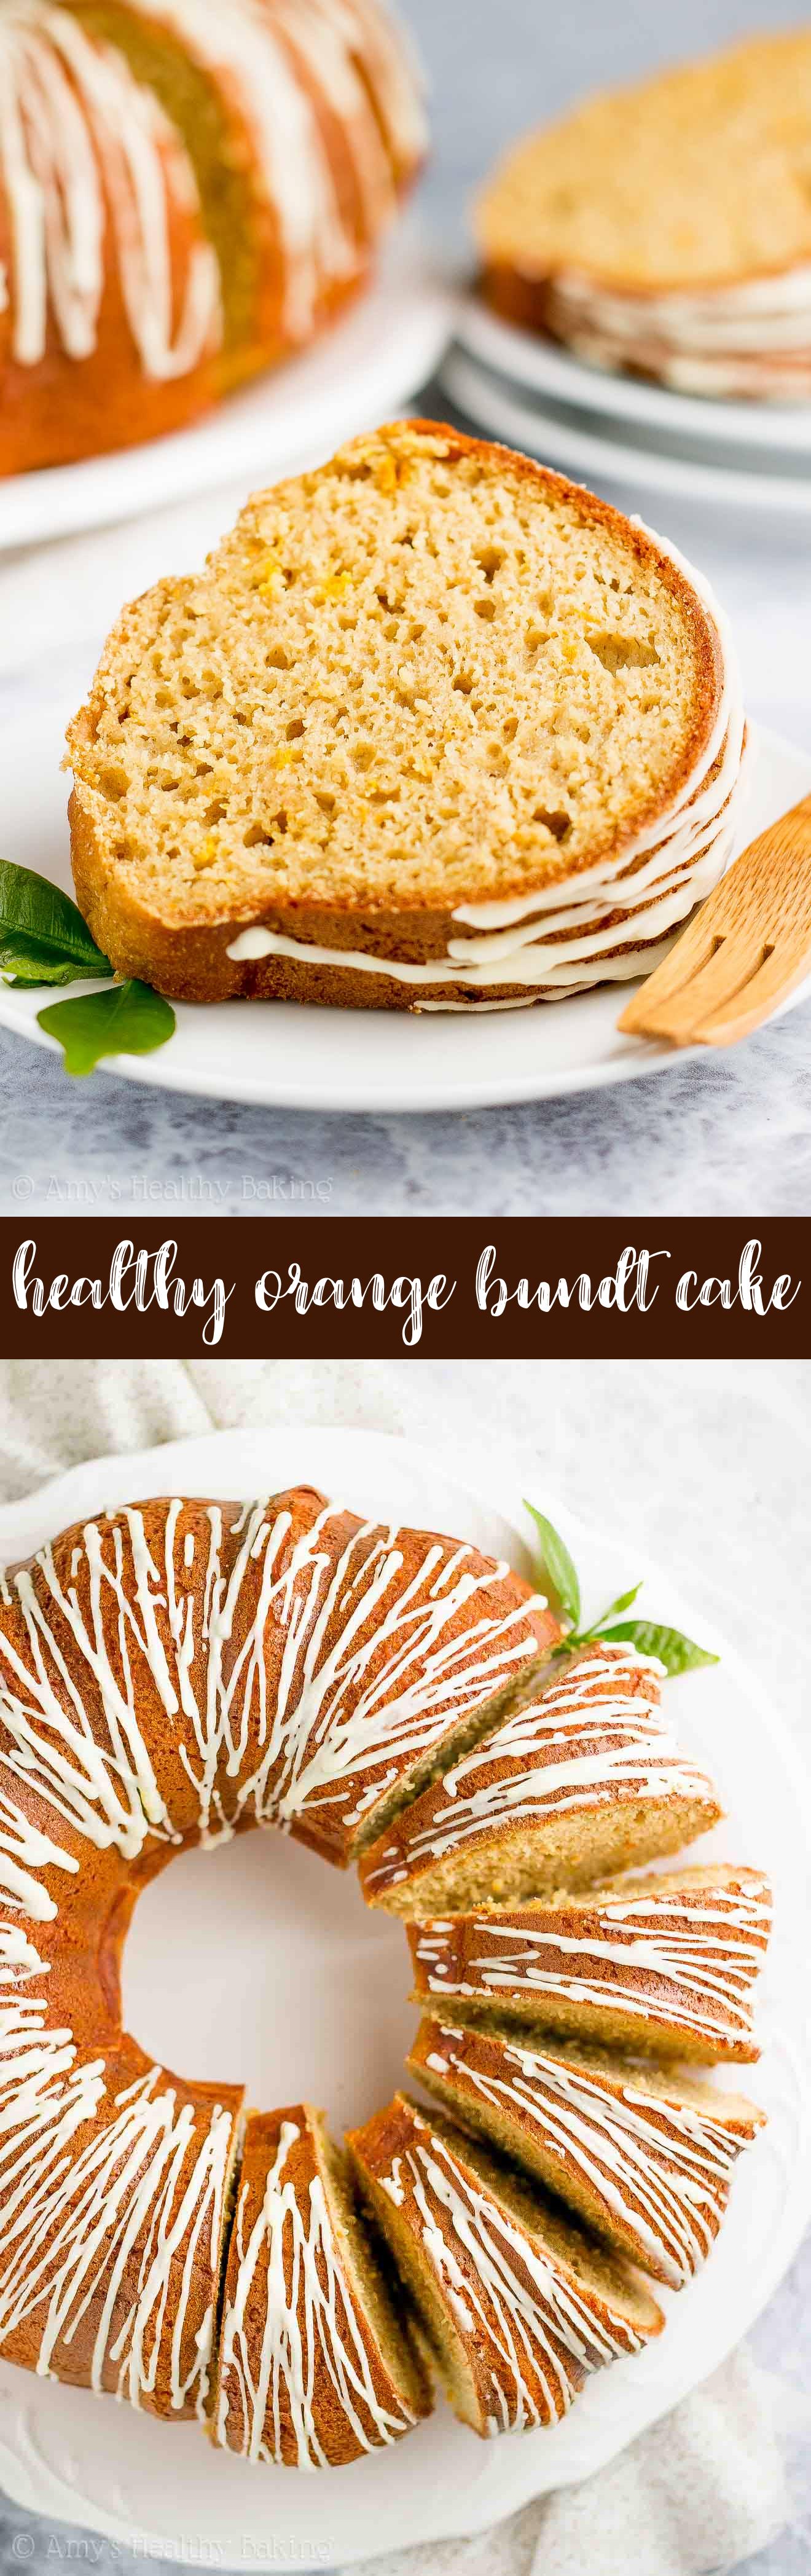 The Best Sugar-Free Healthy Orange Bundt Cake with Orange Glaze Recipe